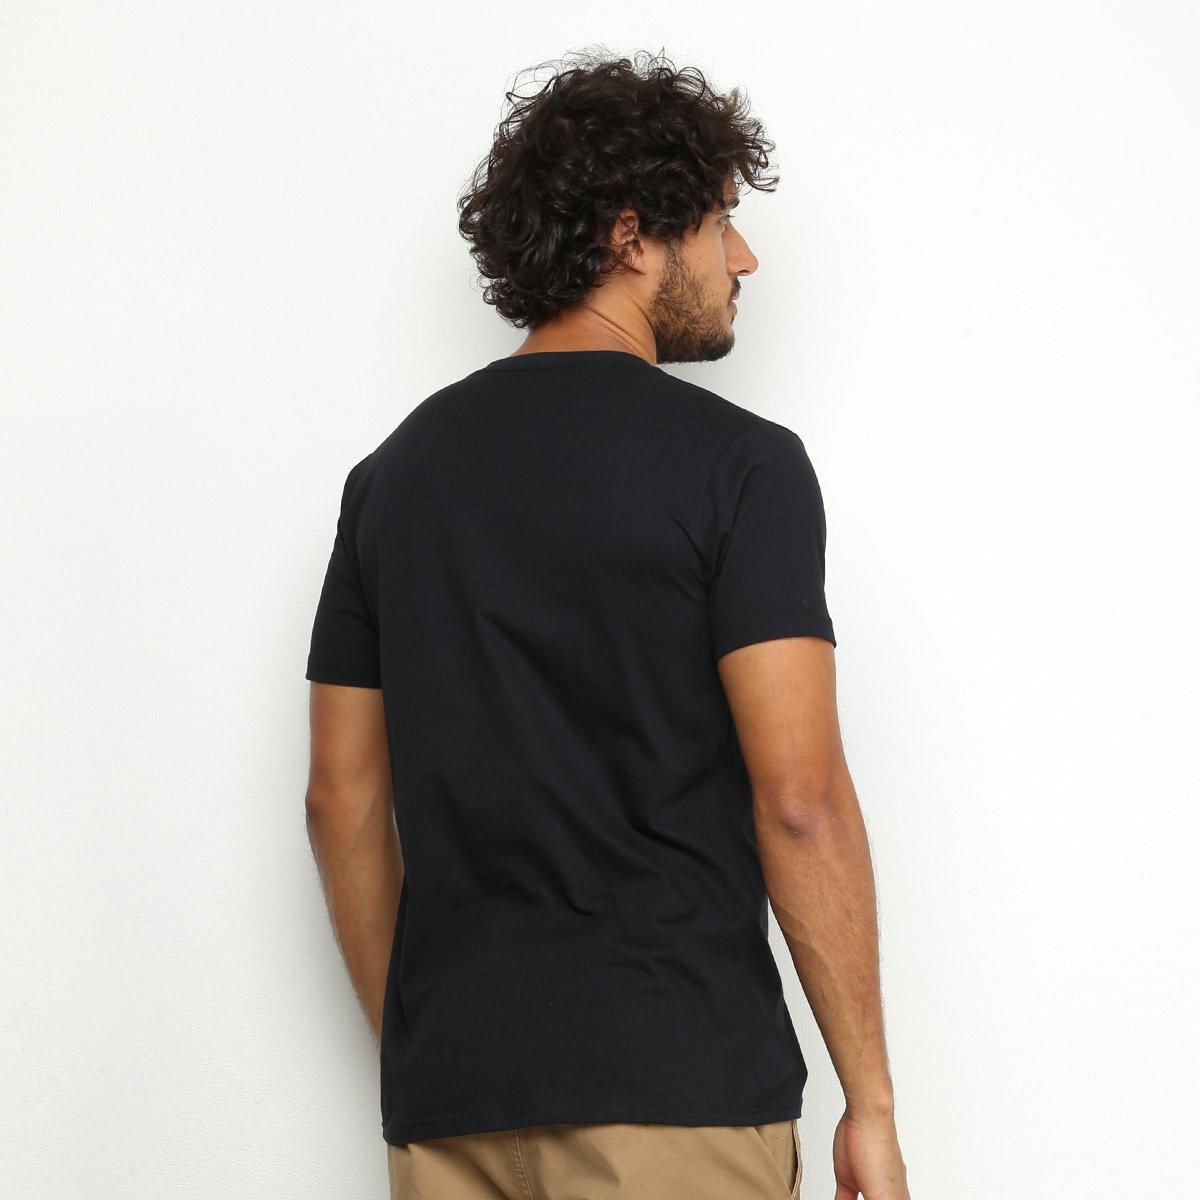 Camiseta Industrie Los Angeles Masculina - Preto